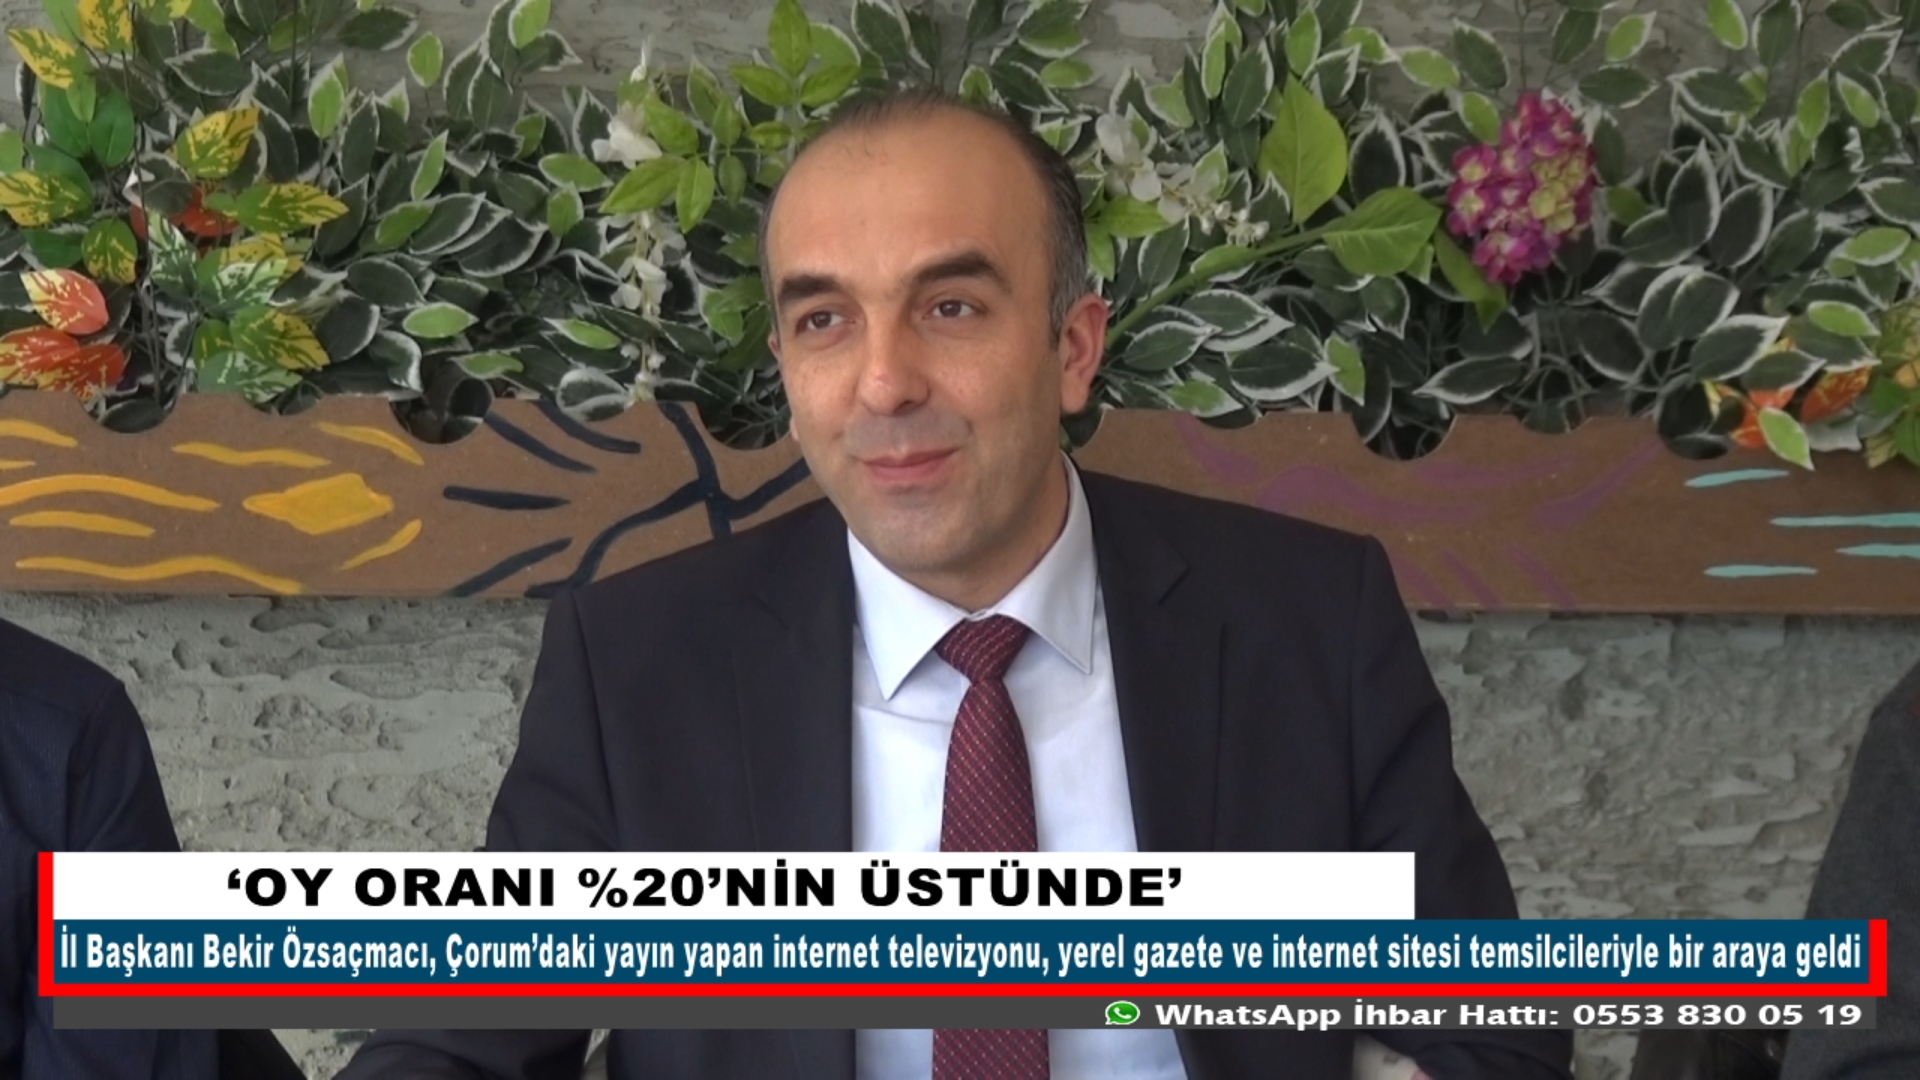 'OY ORANI %20'NİN ÜSTÜNDE'